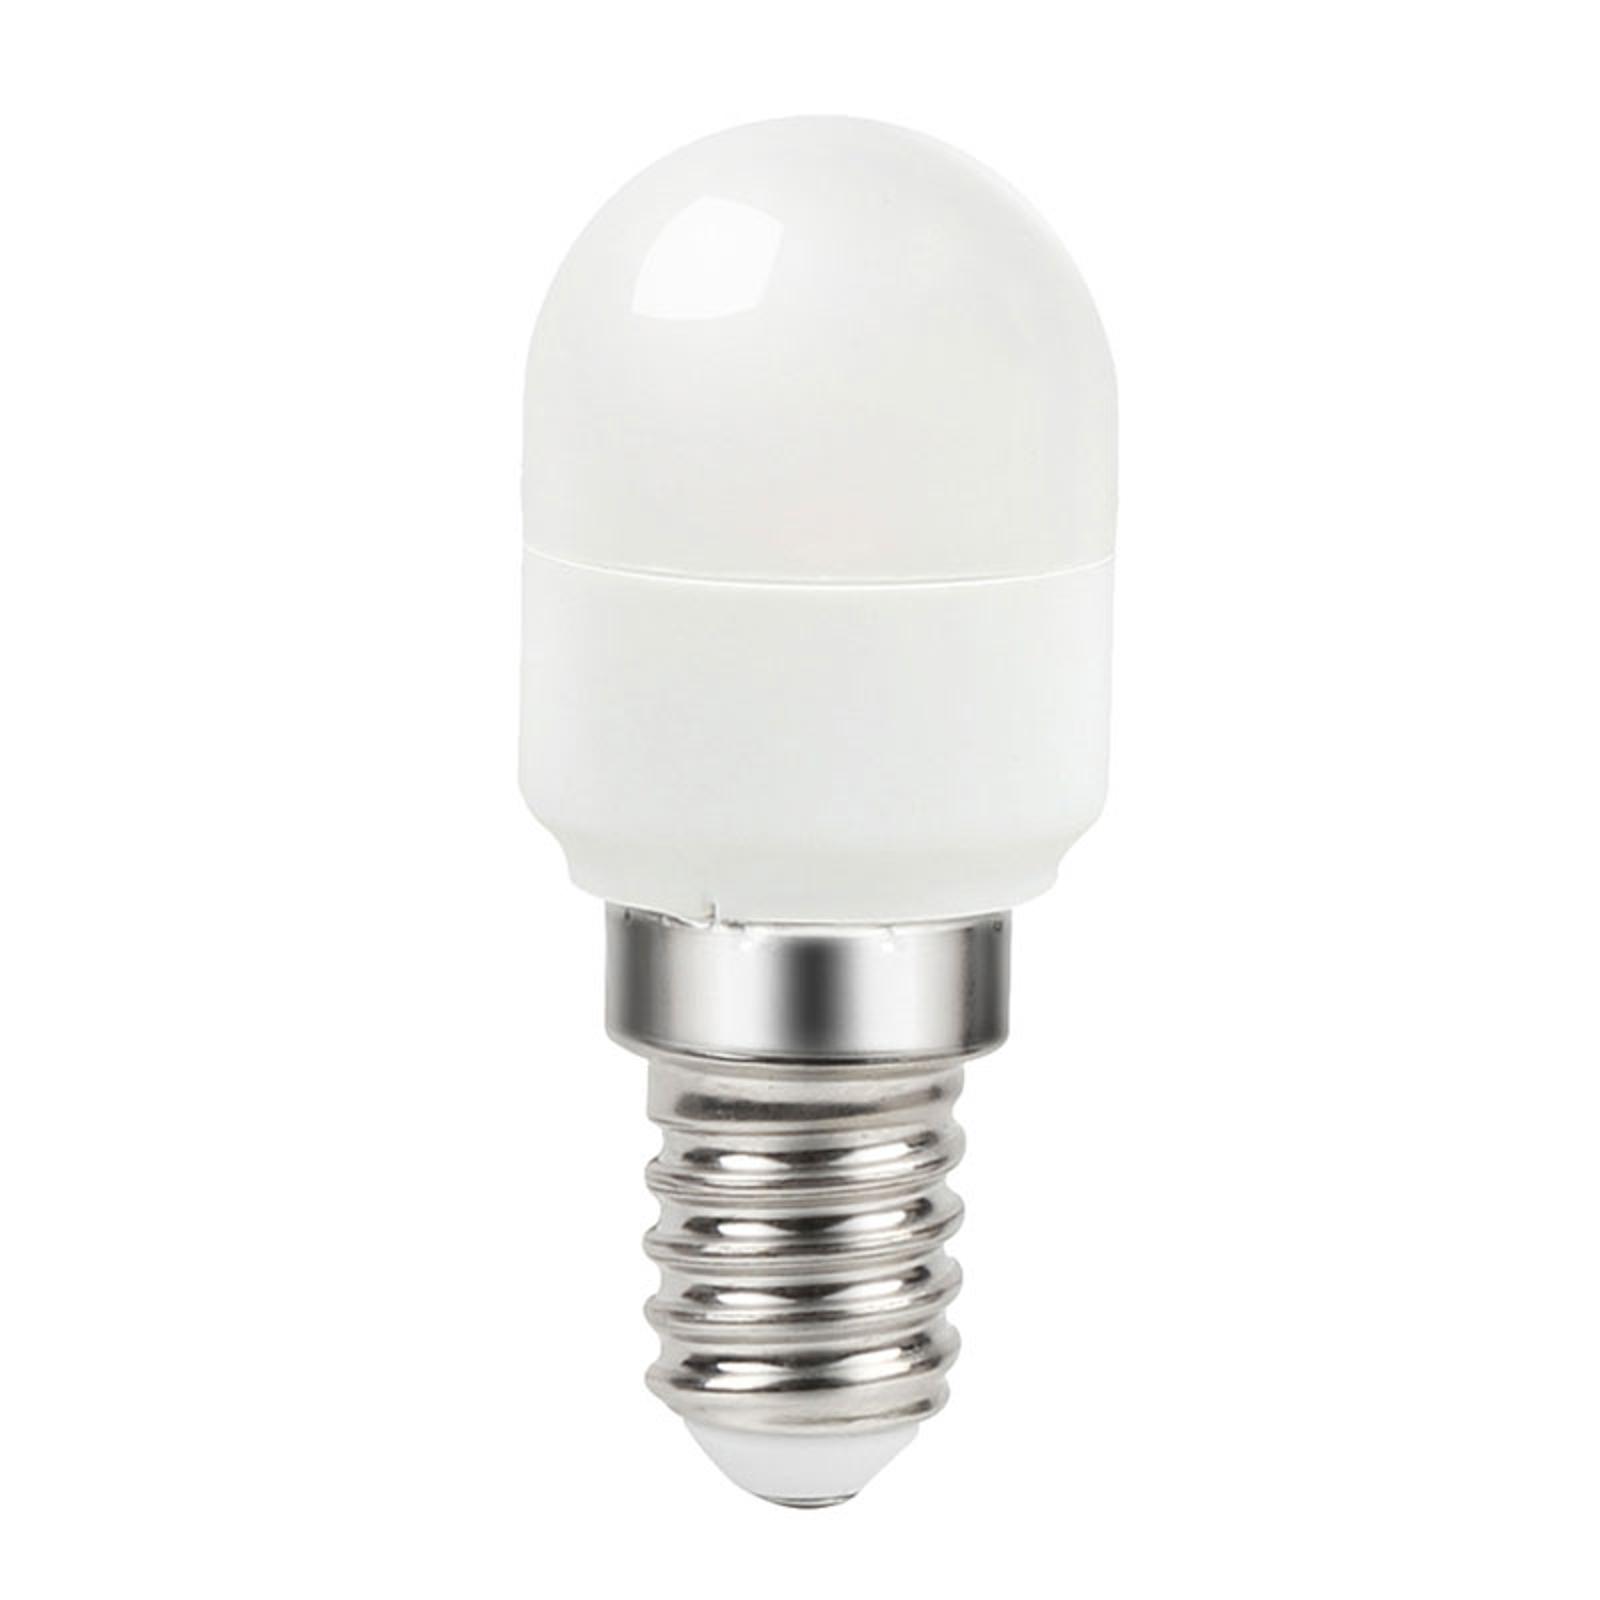 LED-jääkaappilamppu E14 Classic Mini 3,2 W 2 700 K